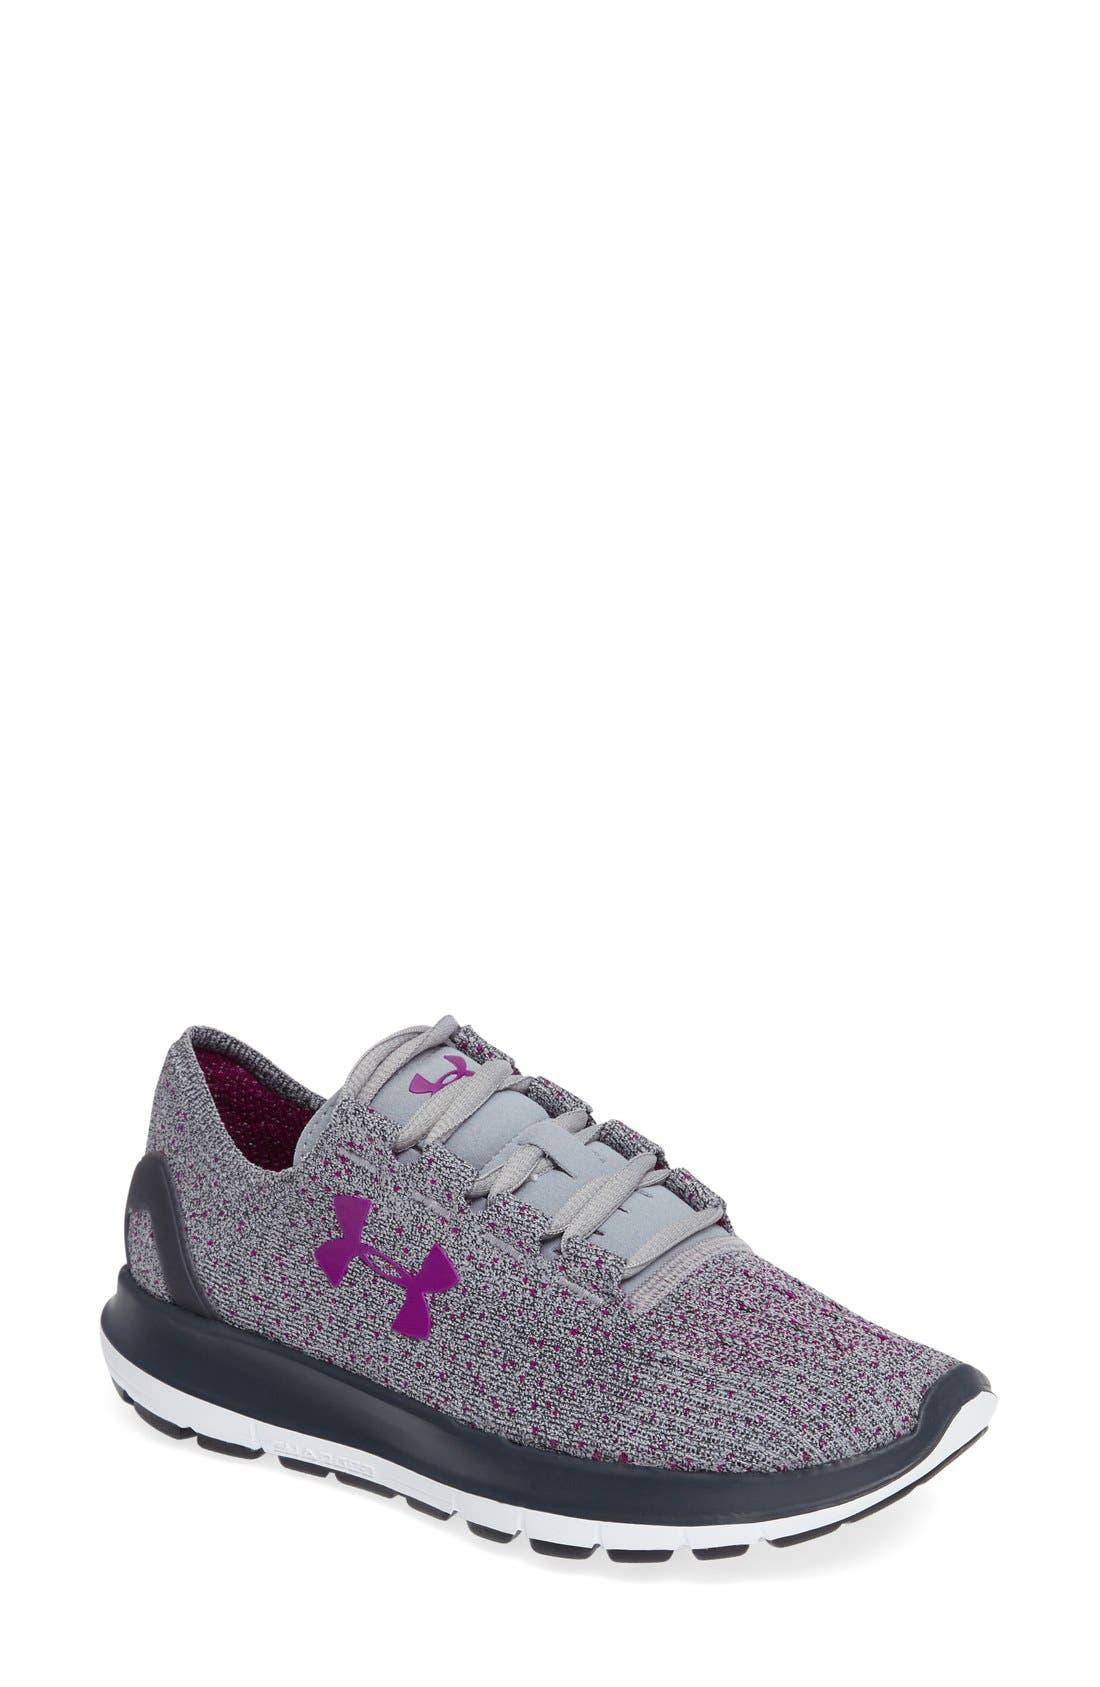 Main Image - Under Armour SpeedForm® Slingride Tri Running Shoe (Women)